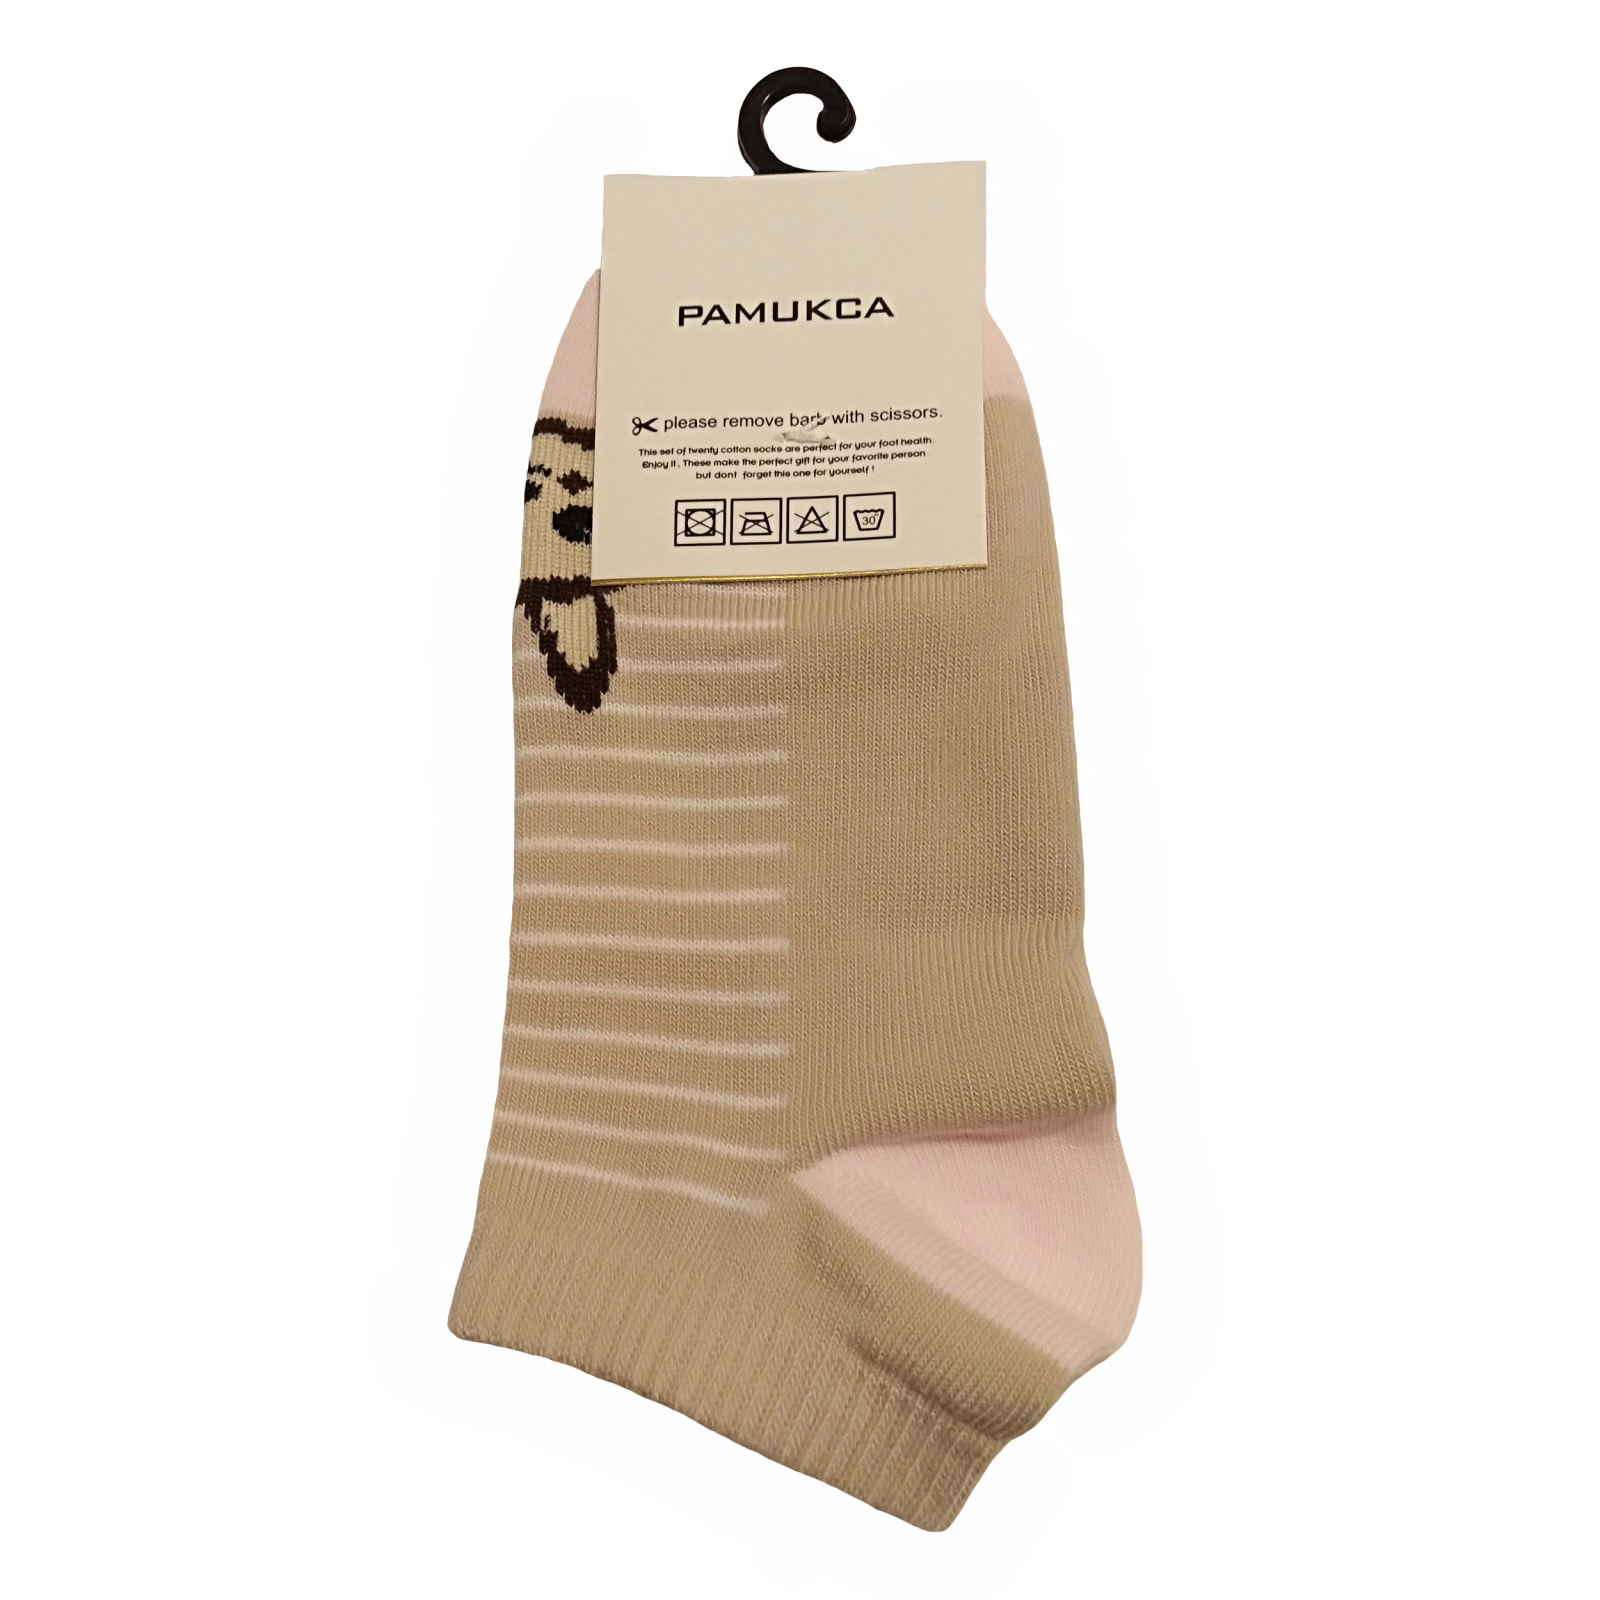 جوراب بچگانه پاموکا مدل A-7 -  - 3